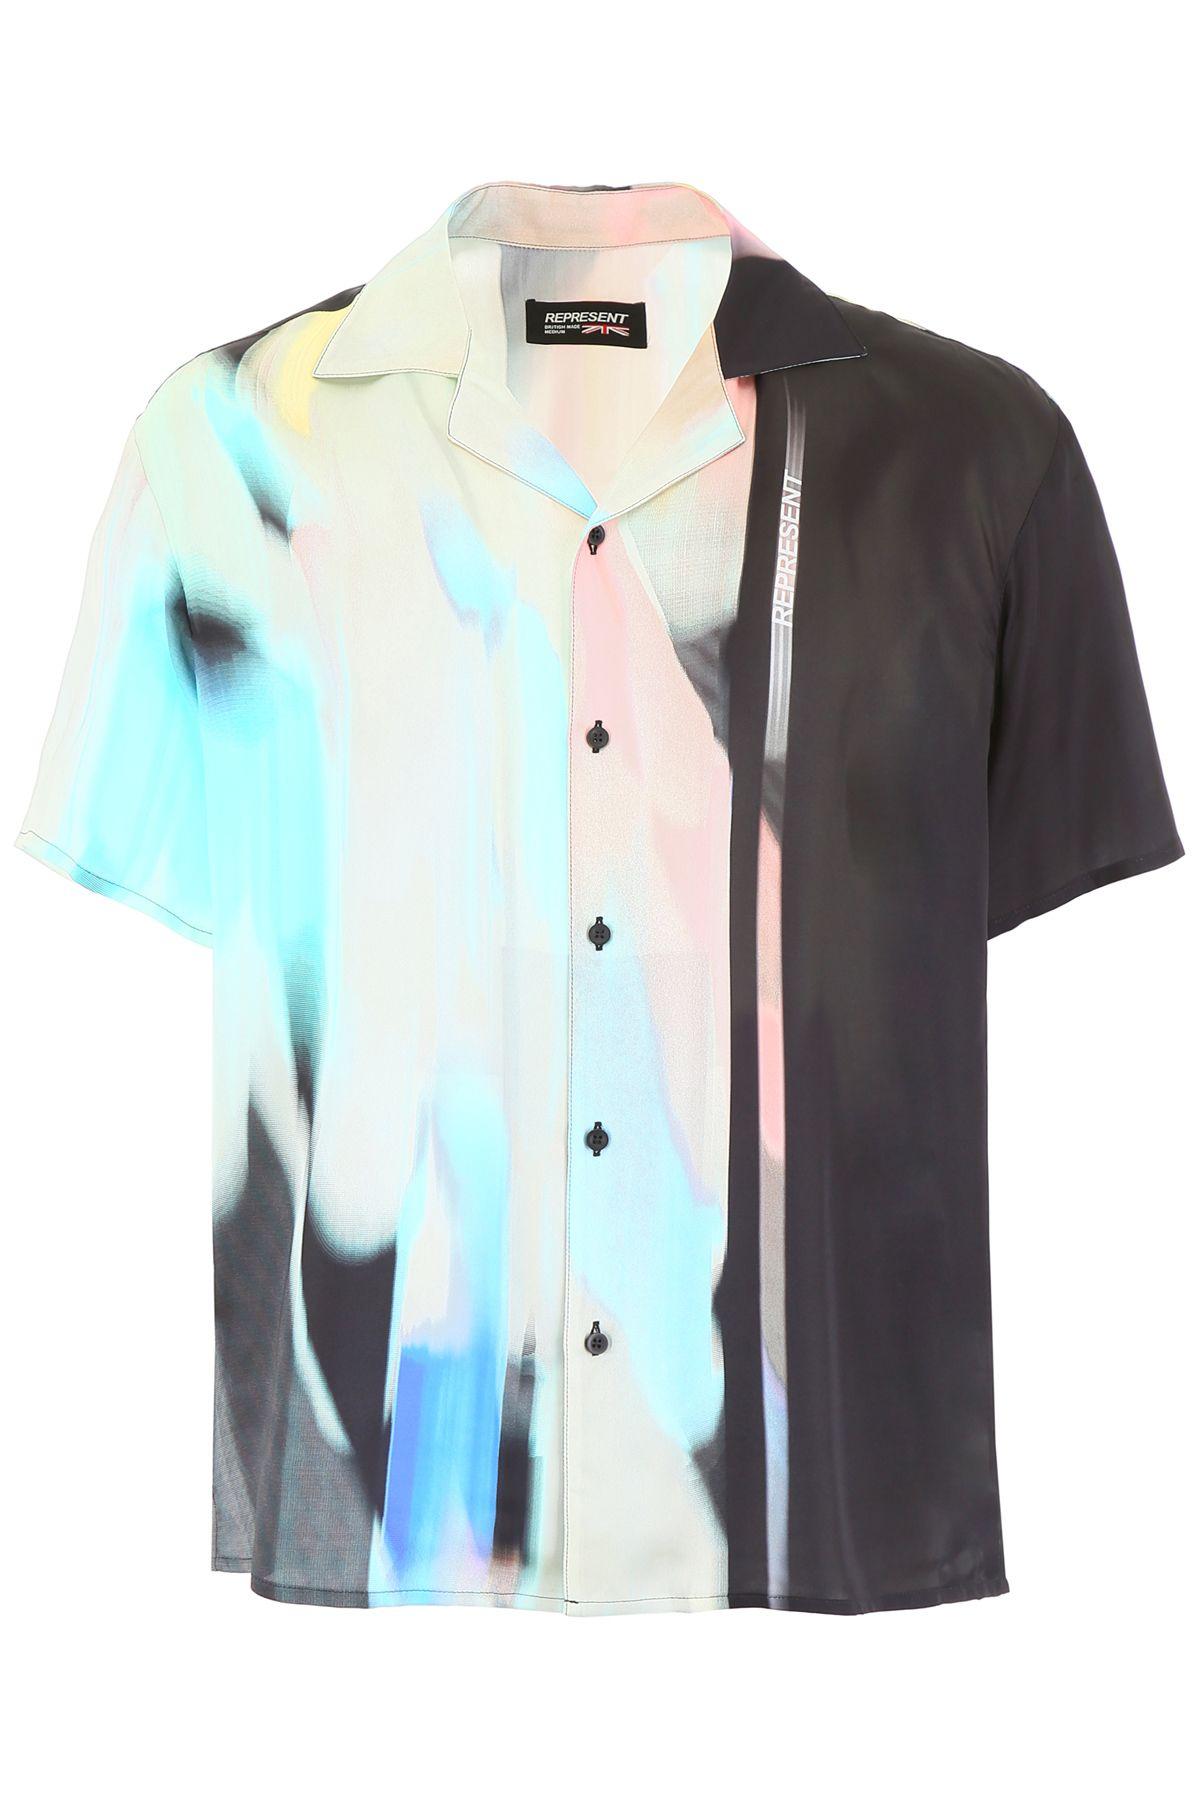 Represent T-shirts TIE-DYE SHIRT